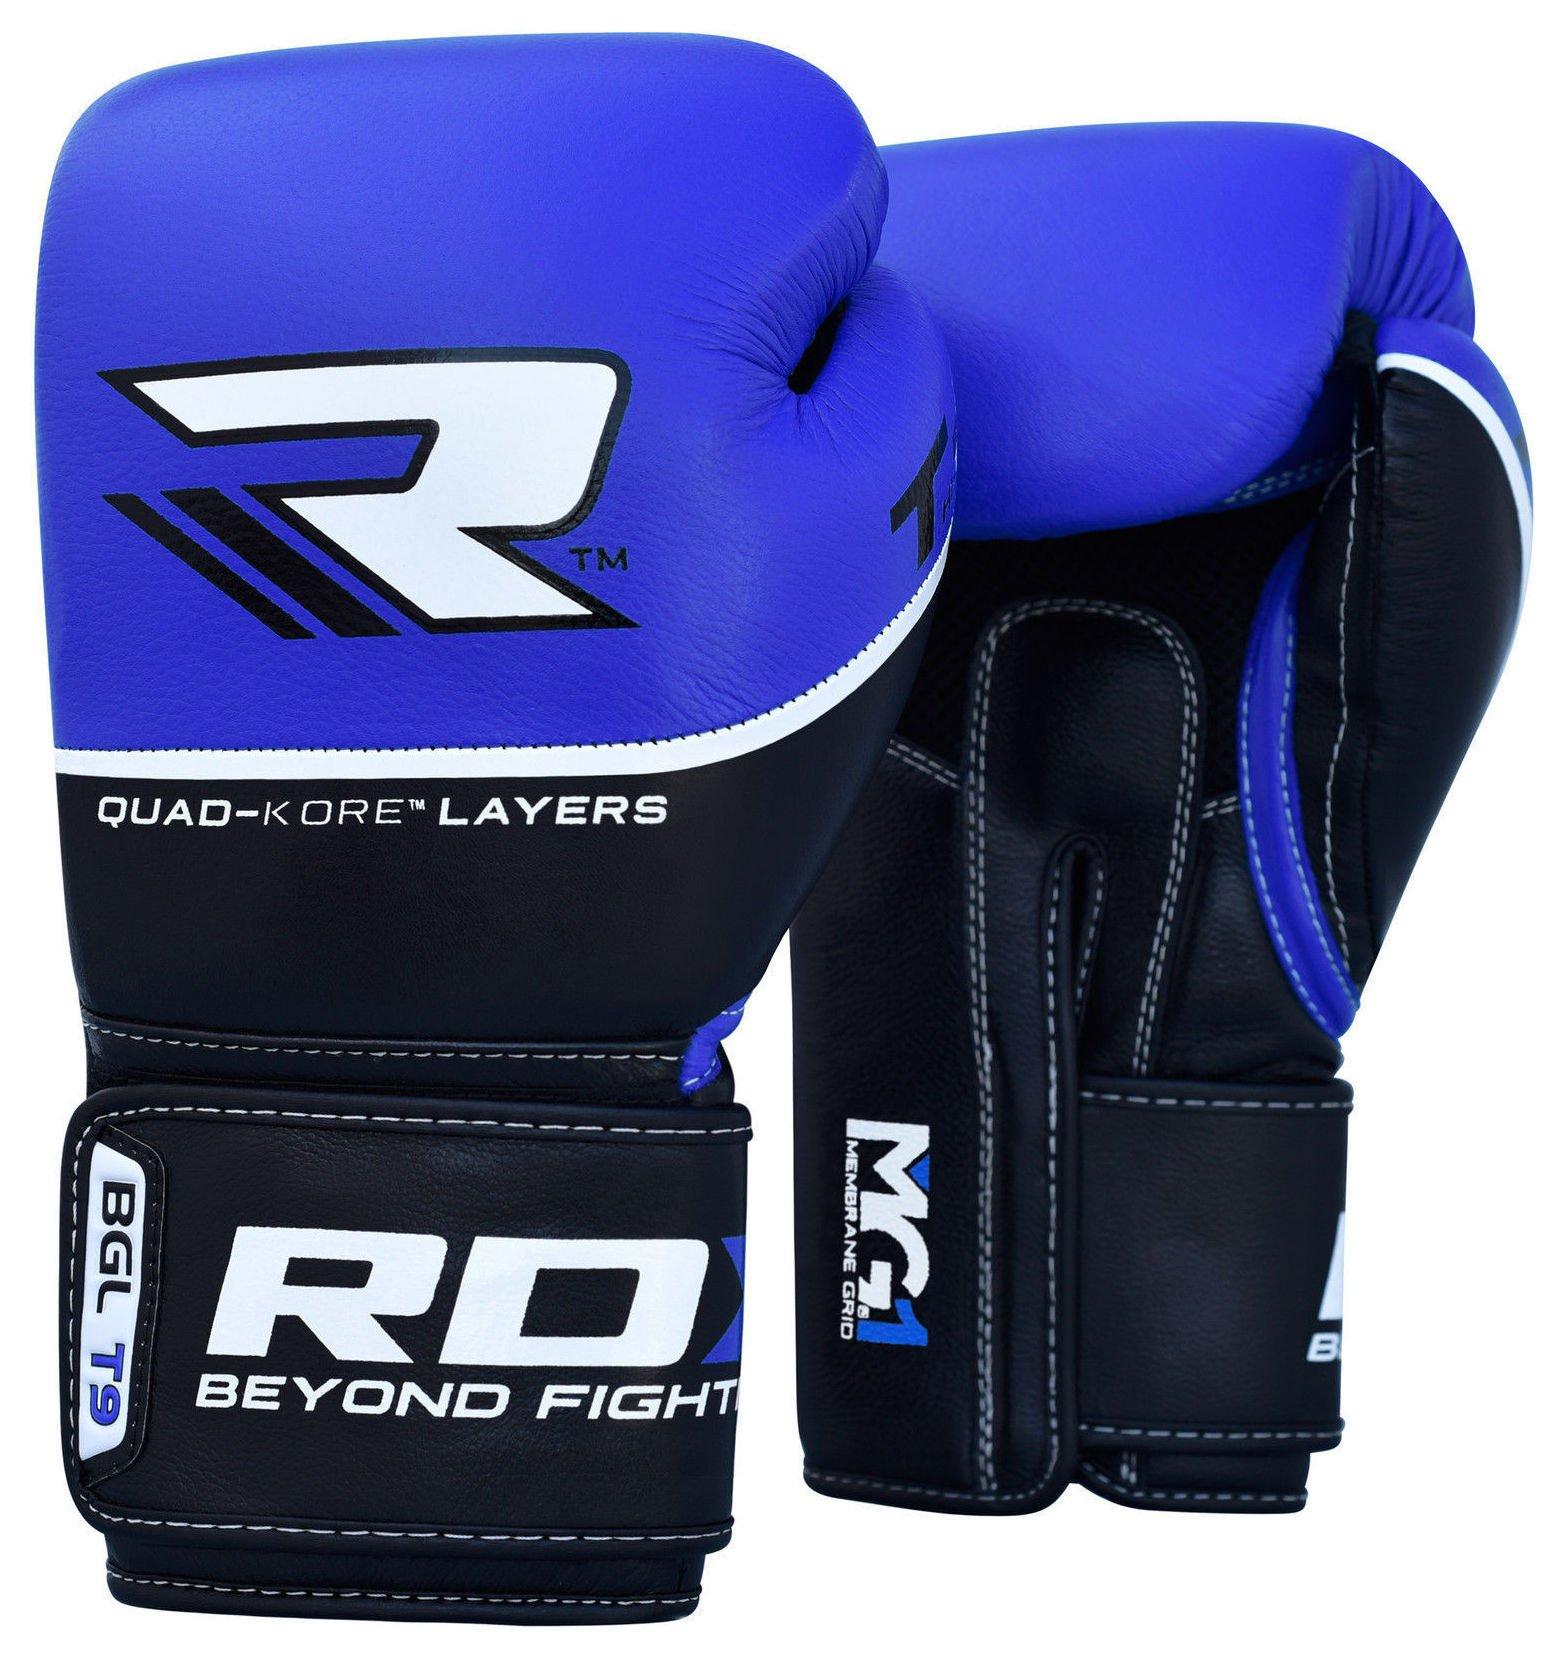 RDX - Quad Kore 16oz Boxing Gloves - Blue lowest price